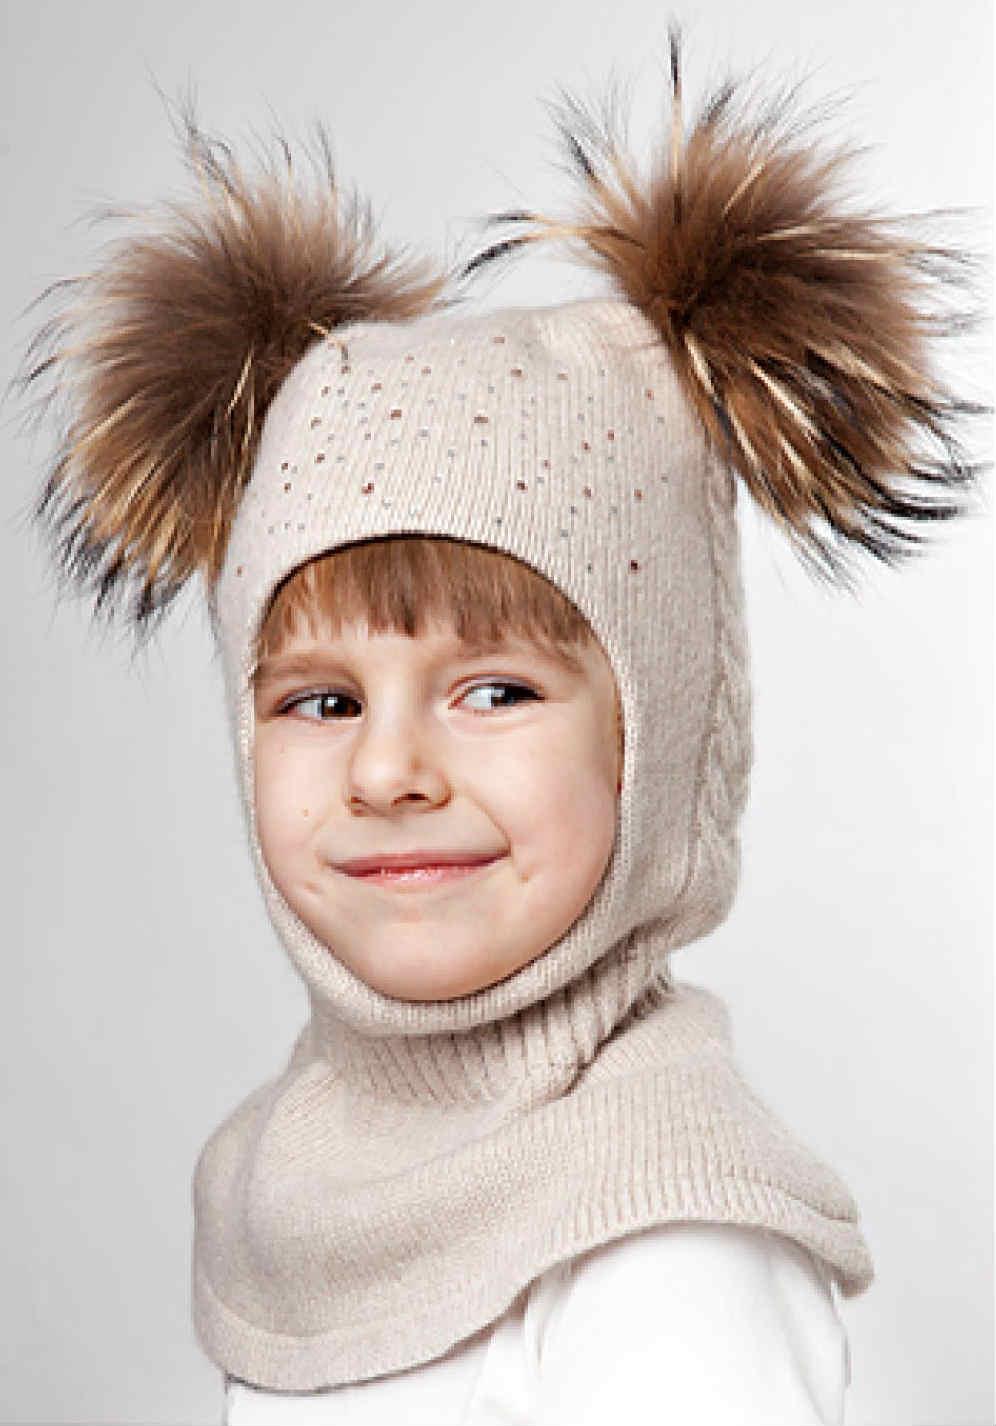 Шапка-шлем для девочки своими руками фото 14